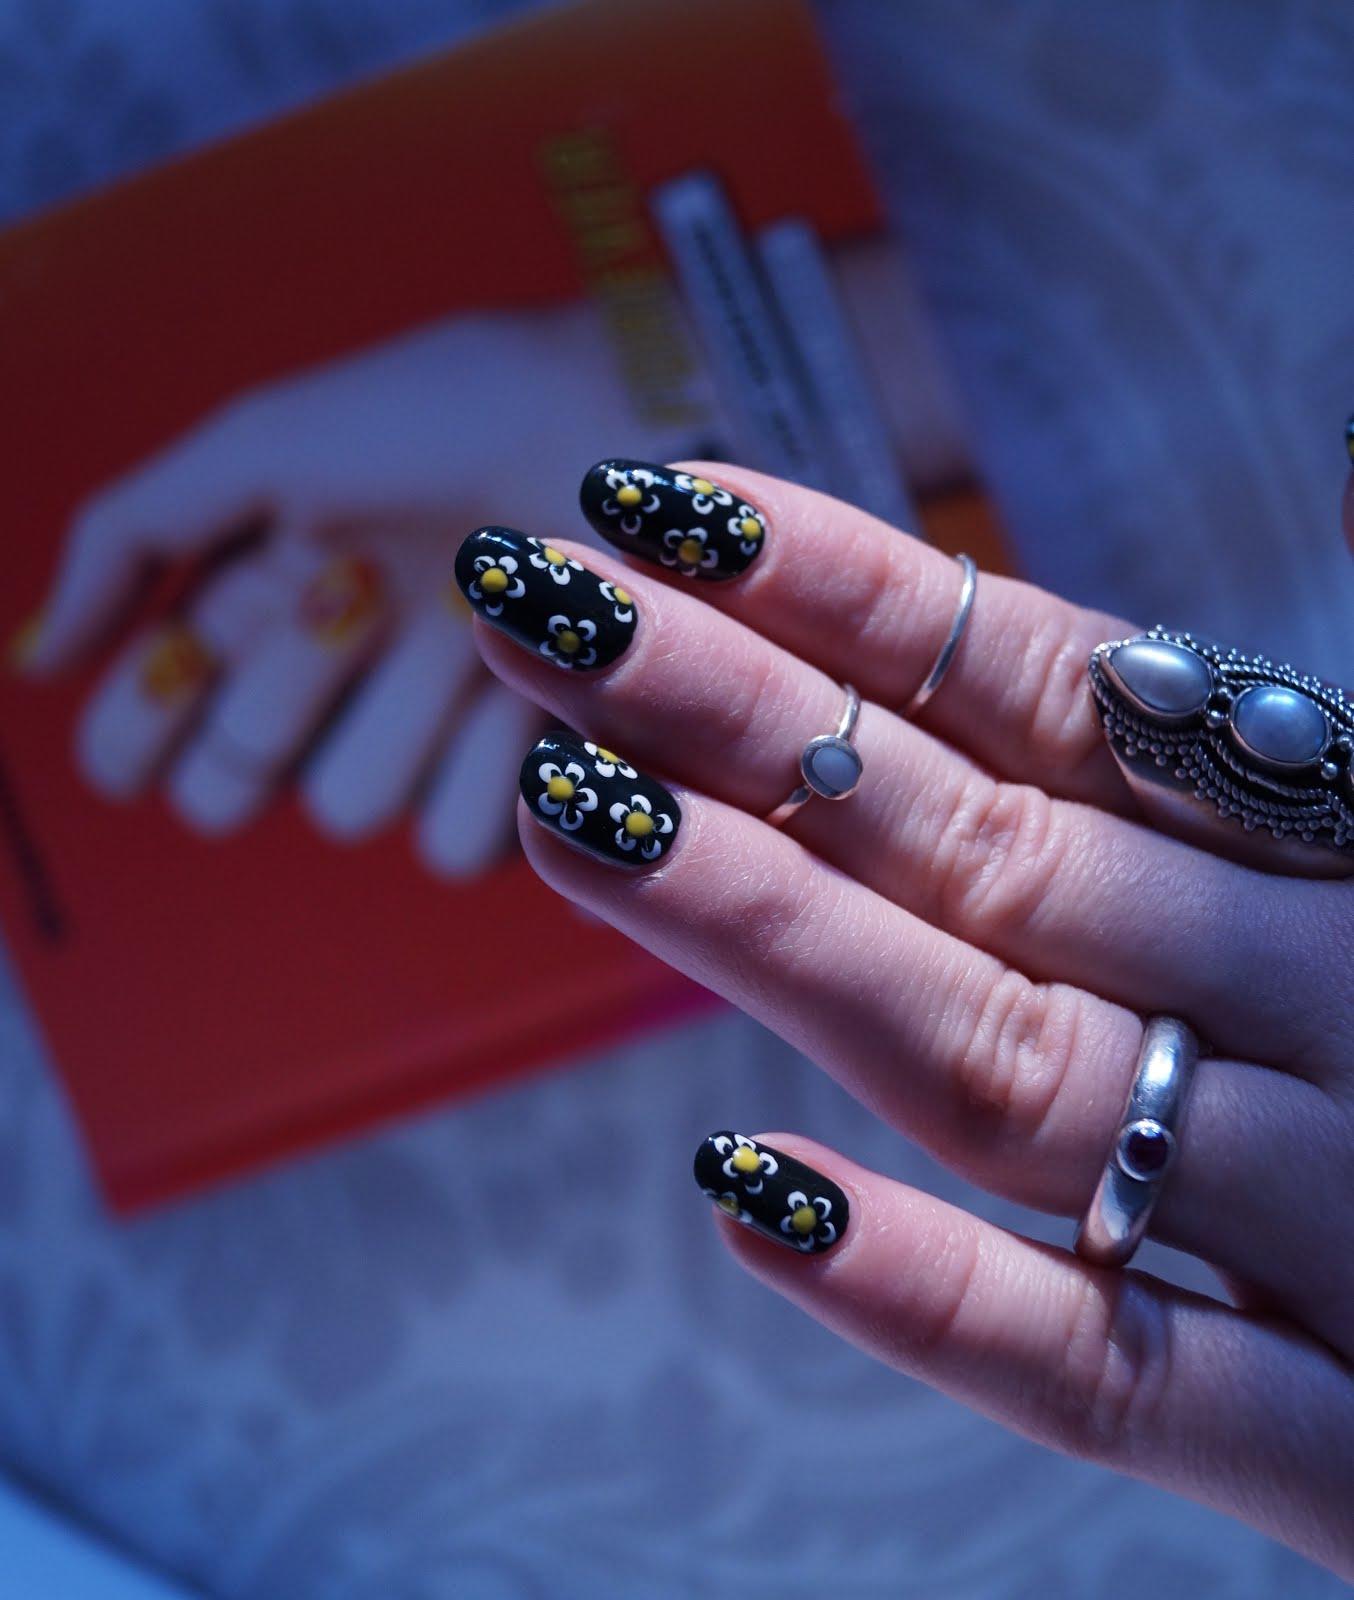 Nail art #daisynails